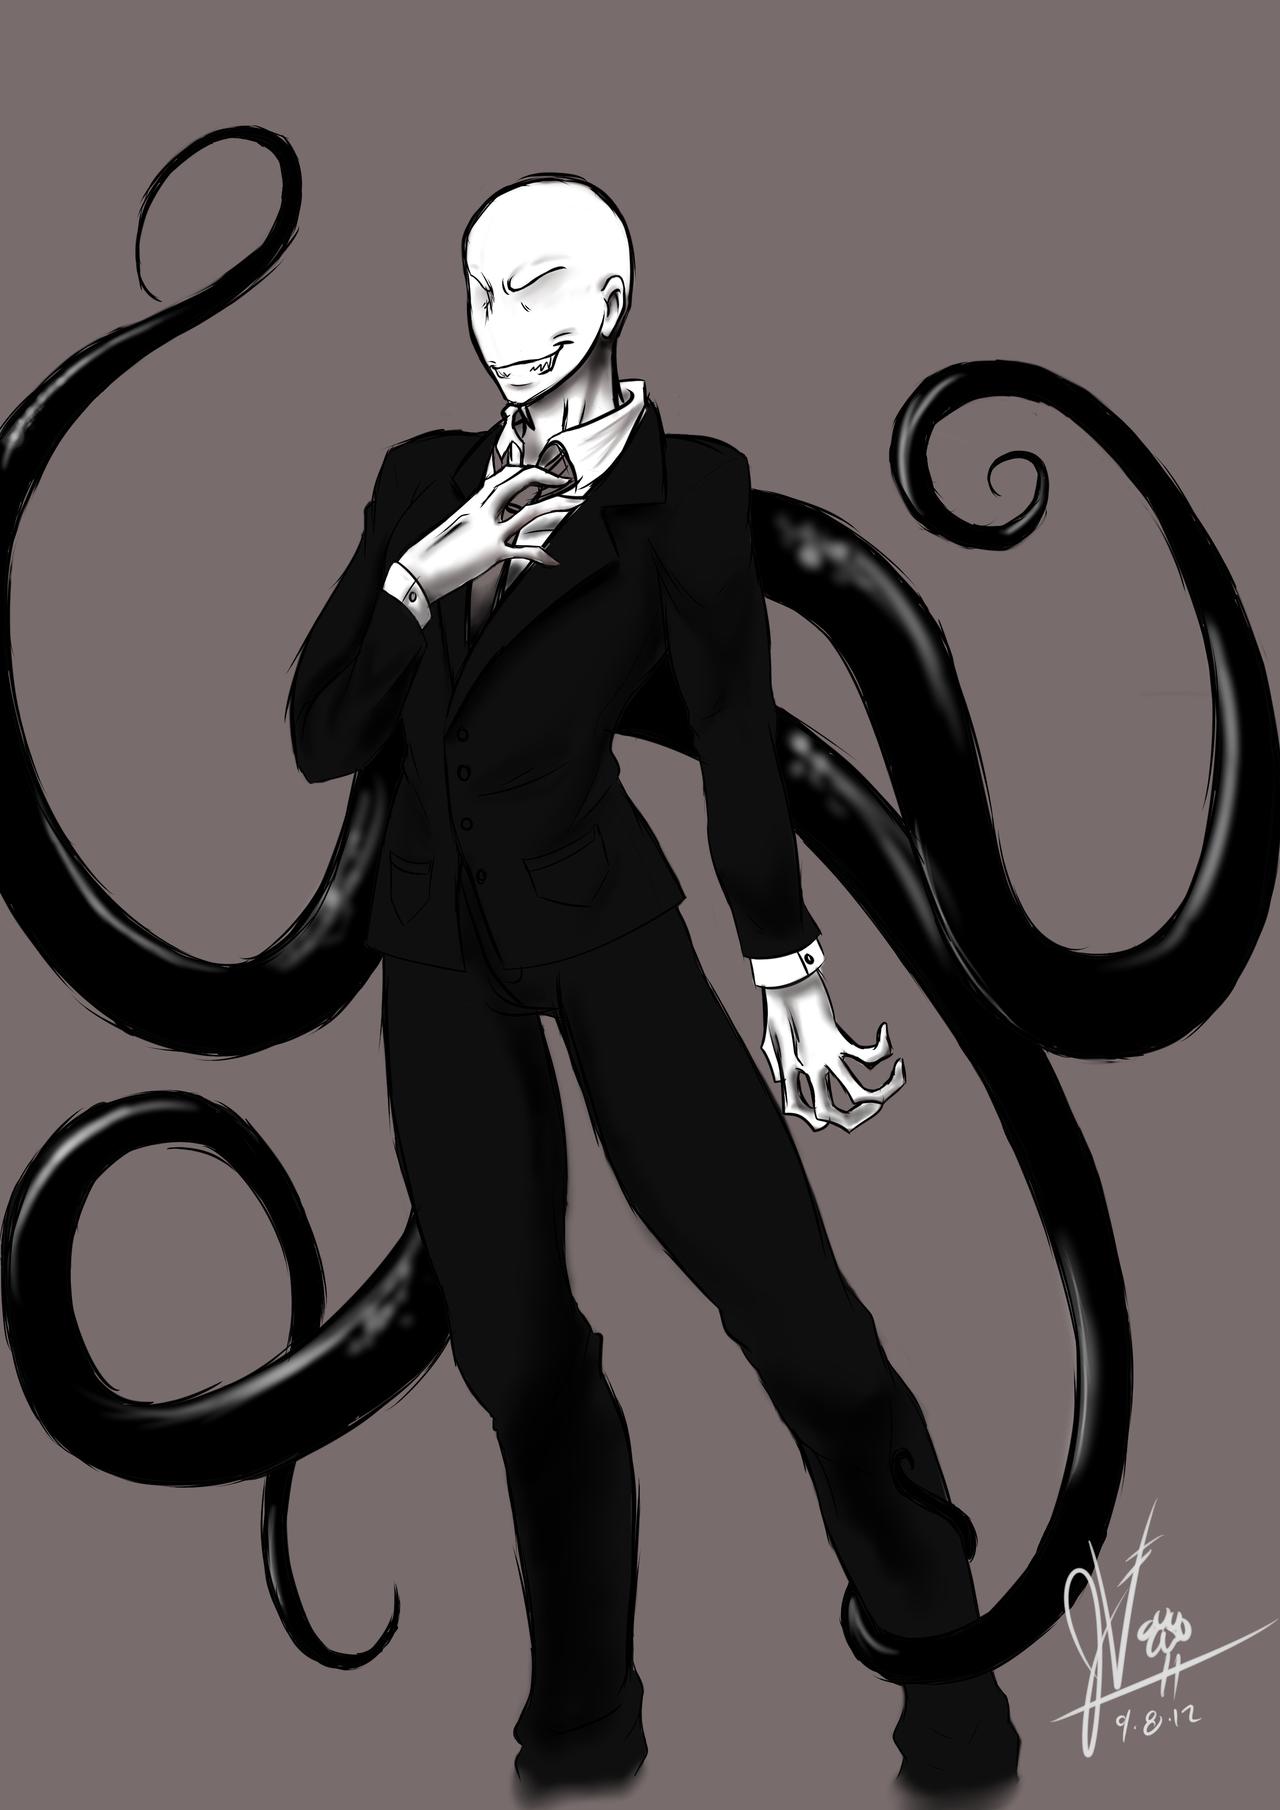 Drawn slenderman anime Man Chibi Slender Slender Anime